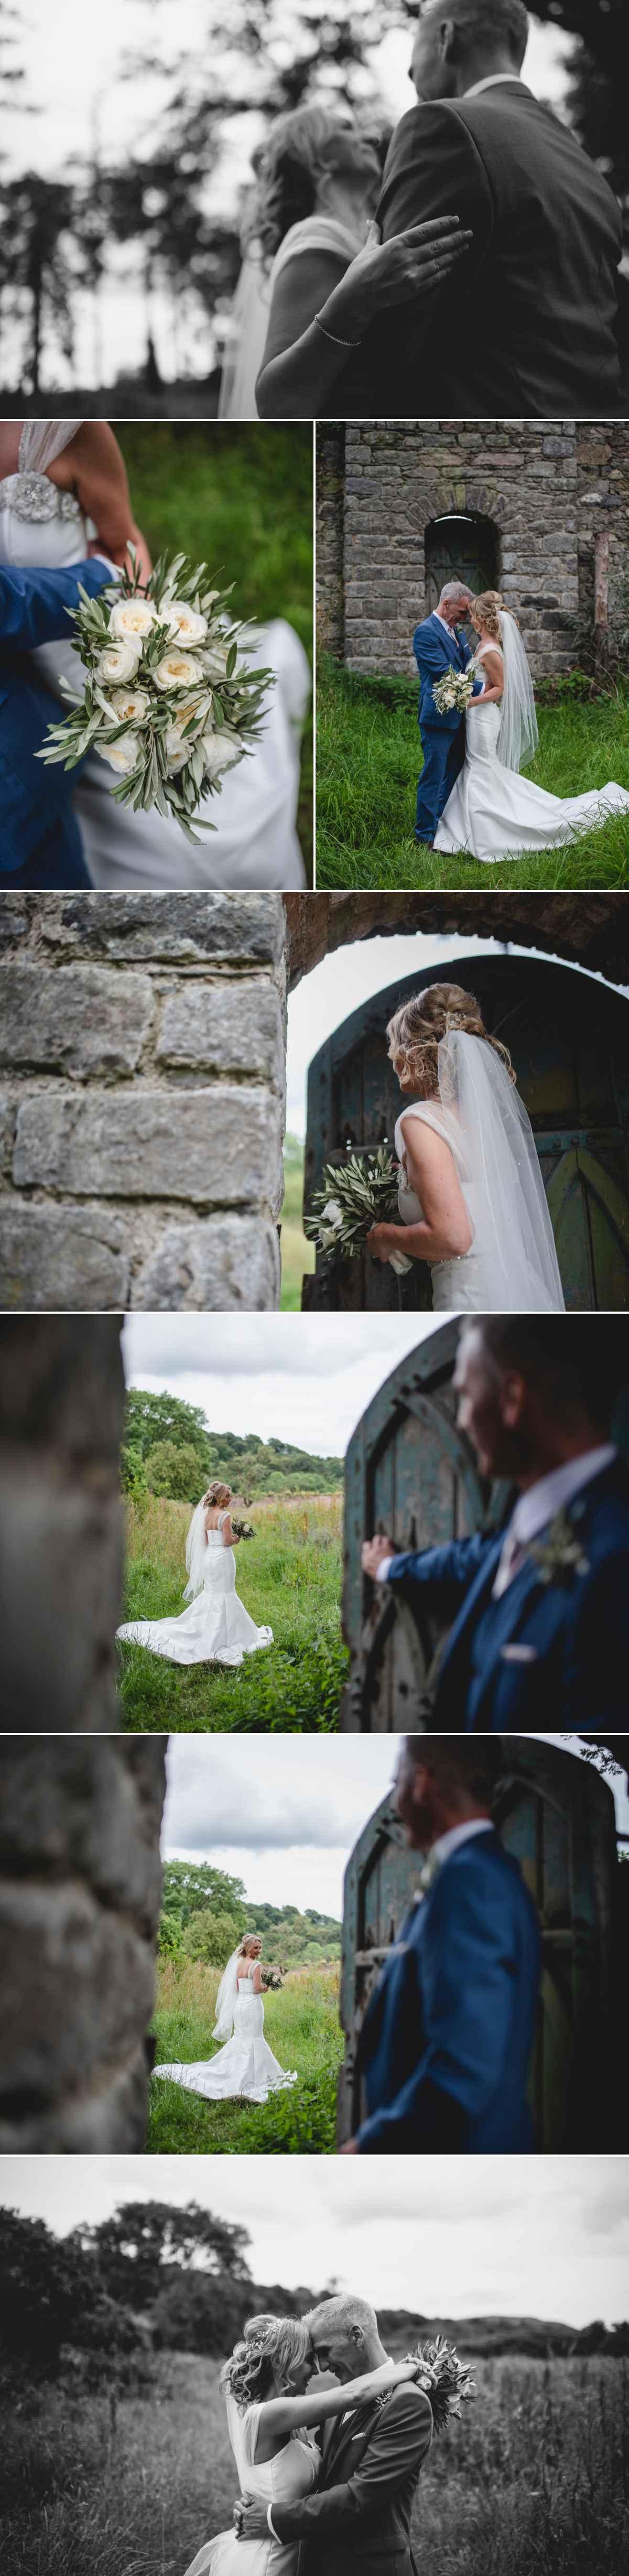 Rustic Wedding Ireland Photographer 12.jpg